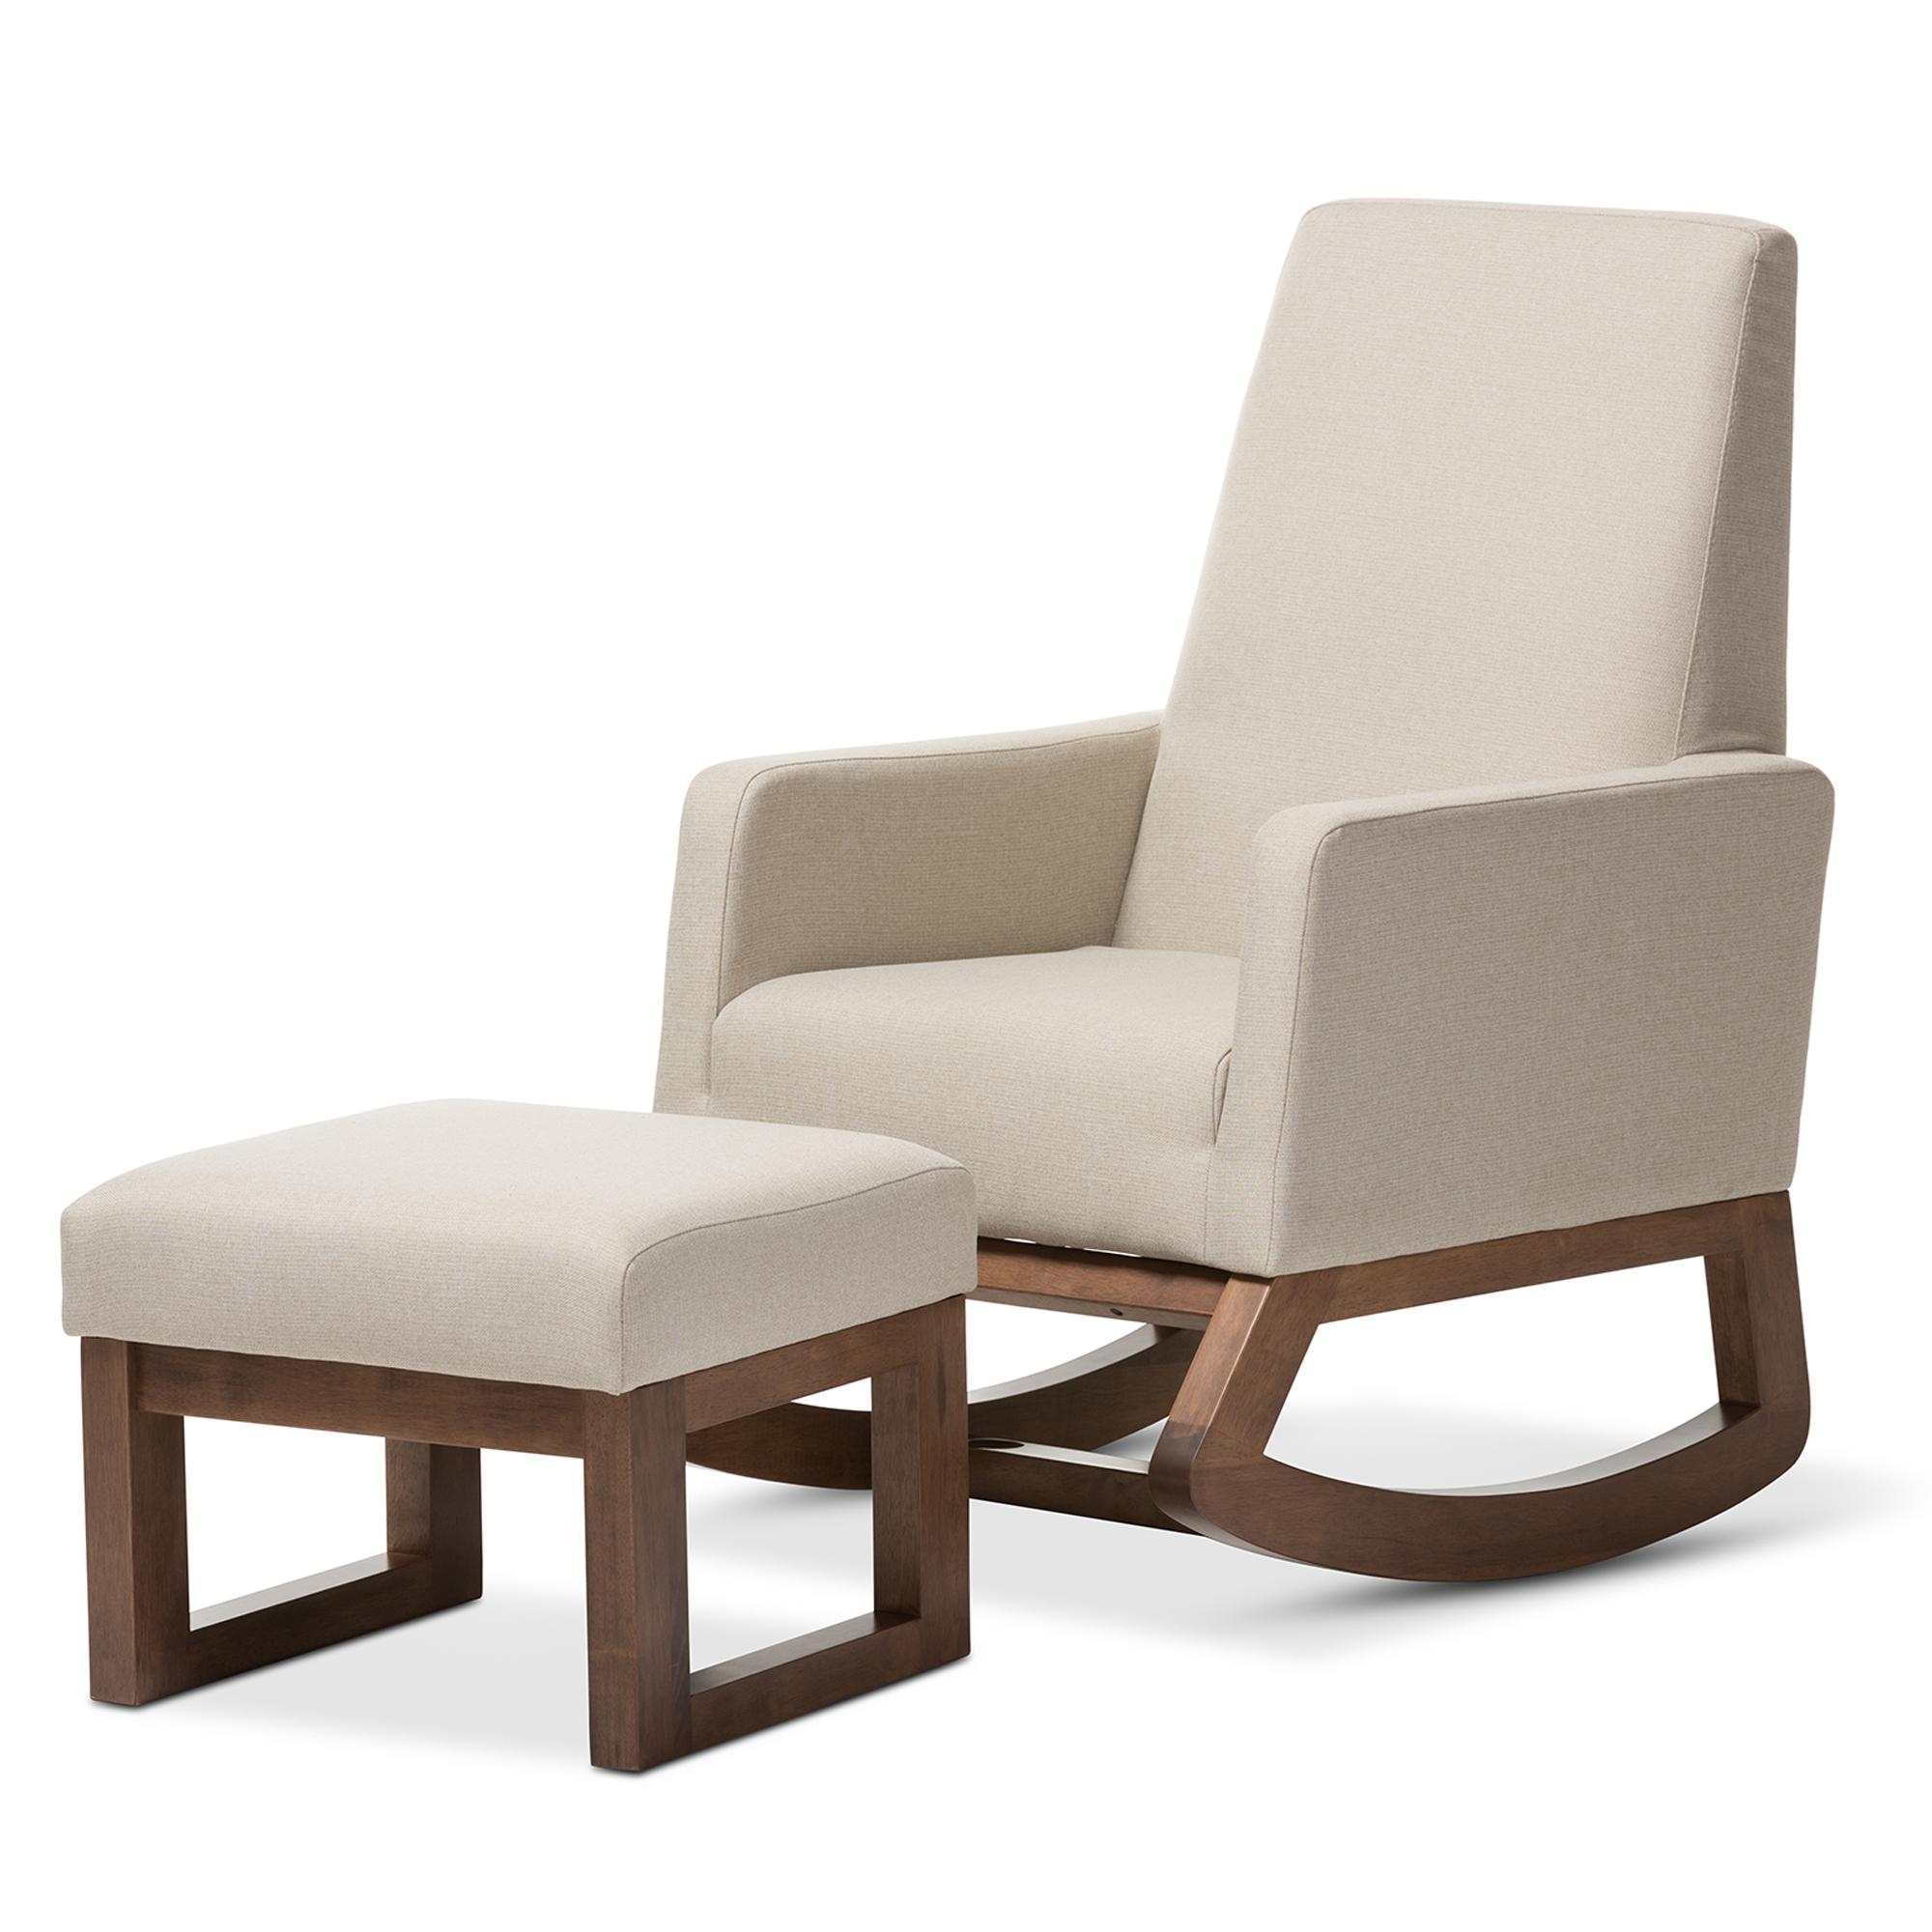 Charmant Baxton Studio Yashiya Mid Century Retro Modern Light Beige Fabric  Upholstered Rocking Chair And Ottoman ...